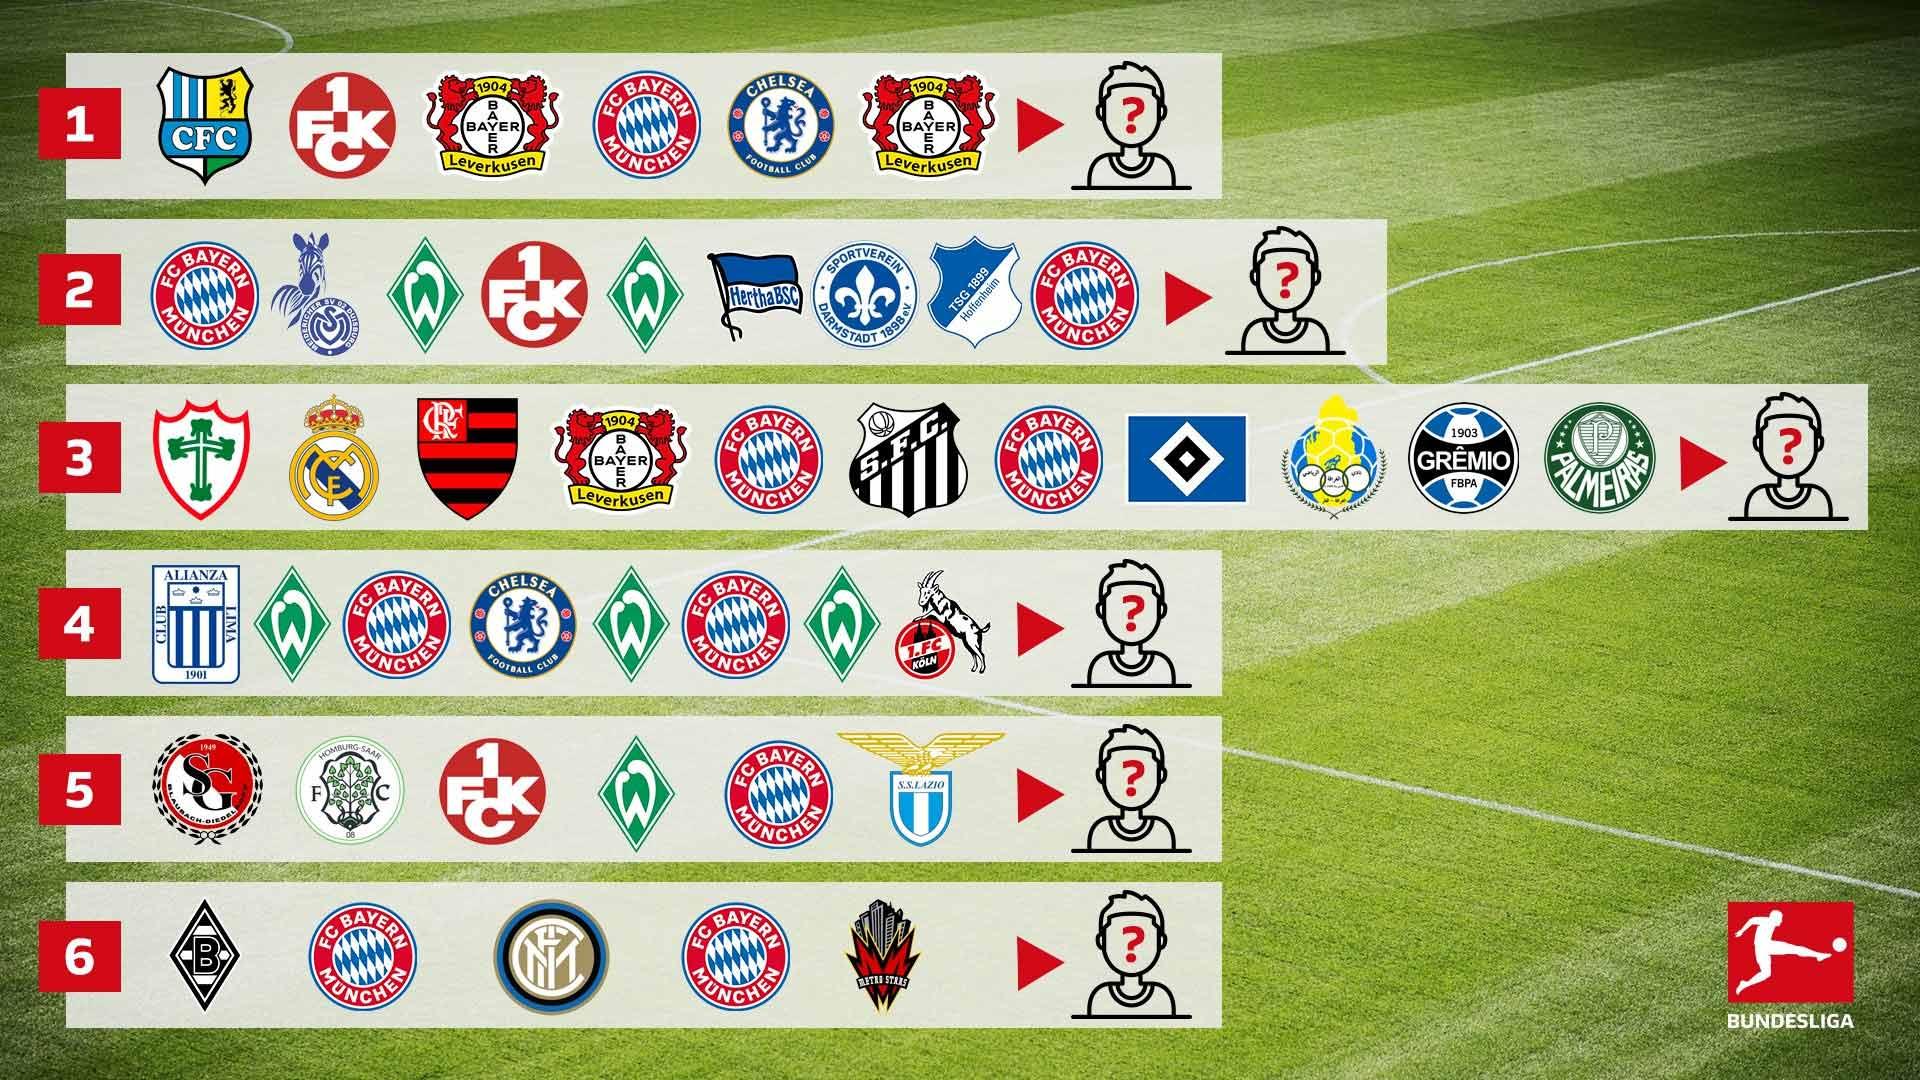 Fußballspieler Kreuzworträtsel